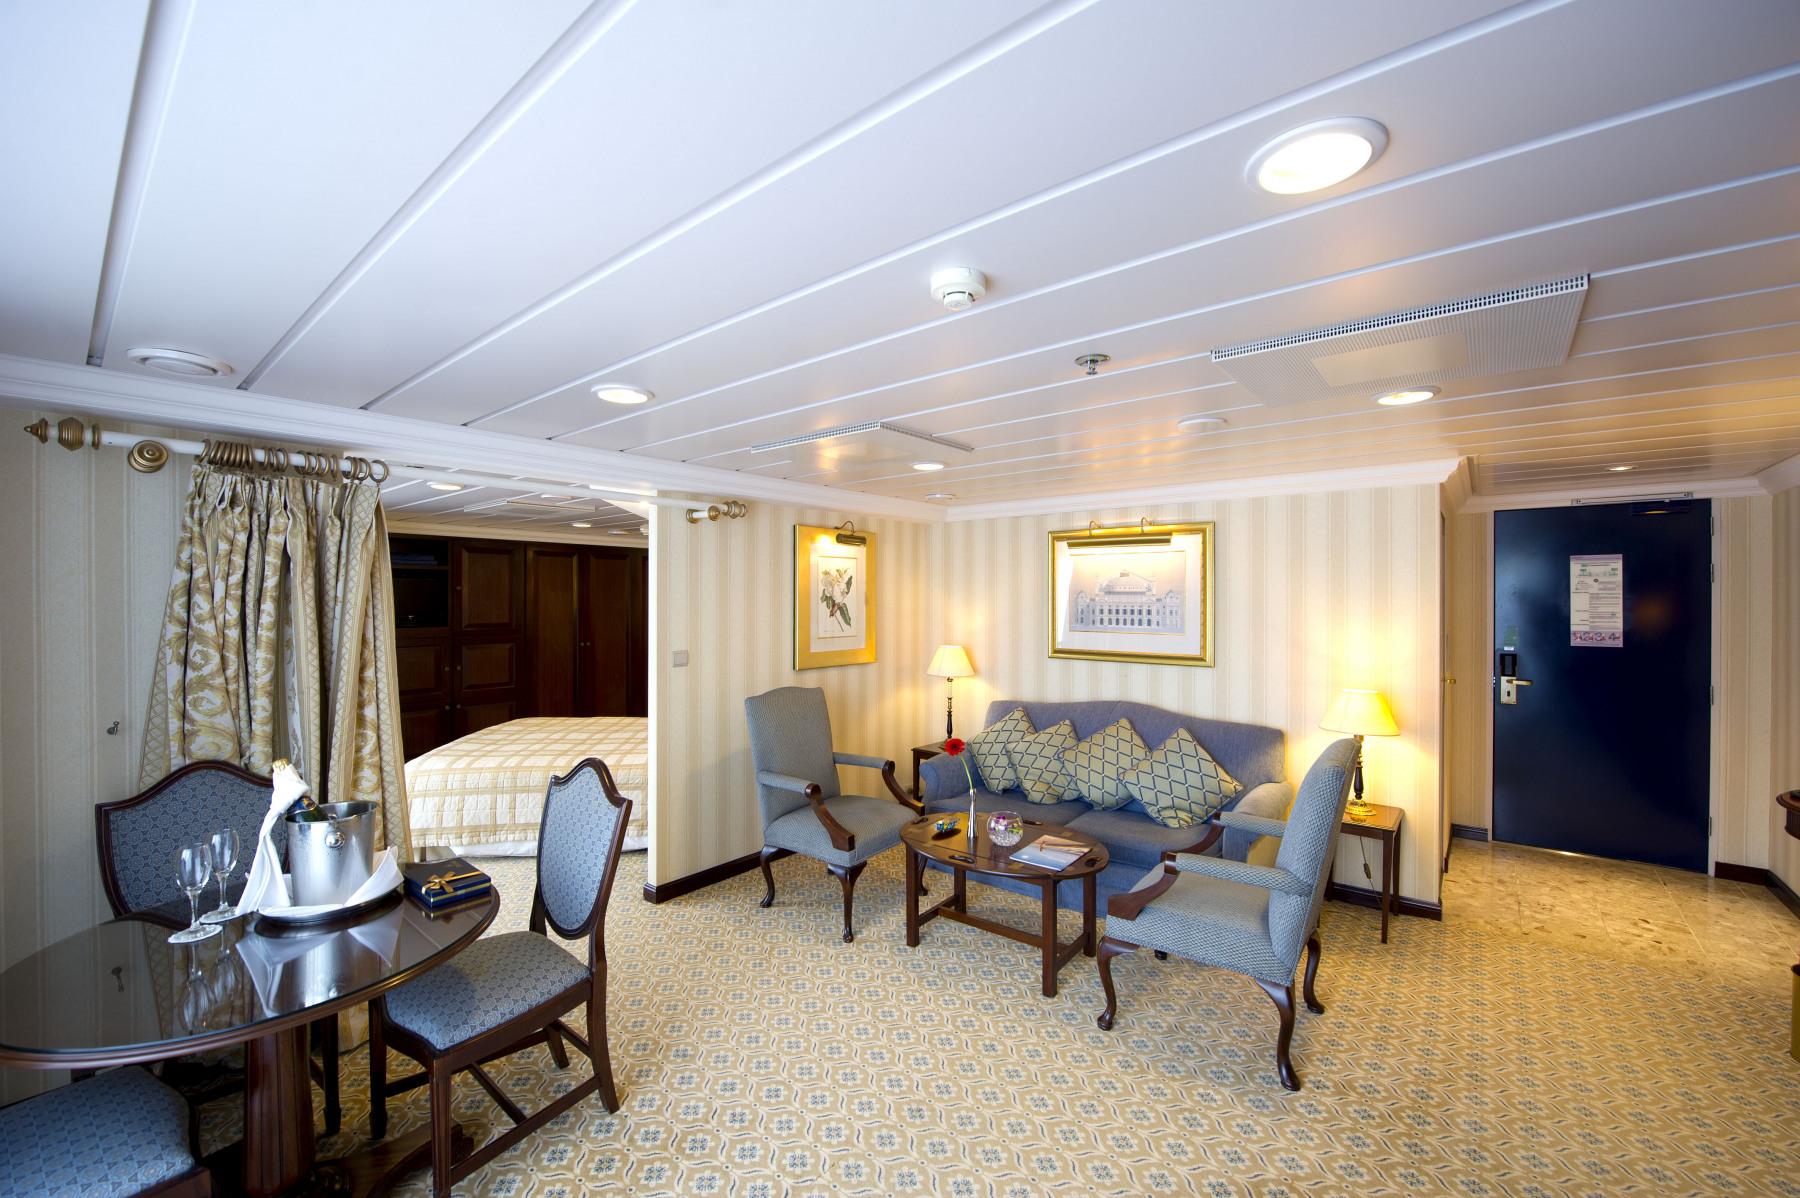 P&O Cruises Adonia Accommodation Penthouse Suite 2.jpg